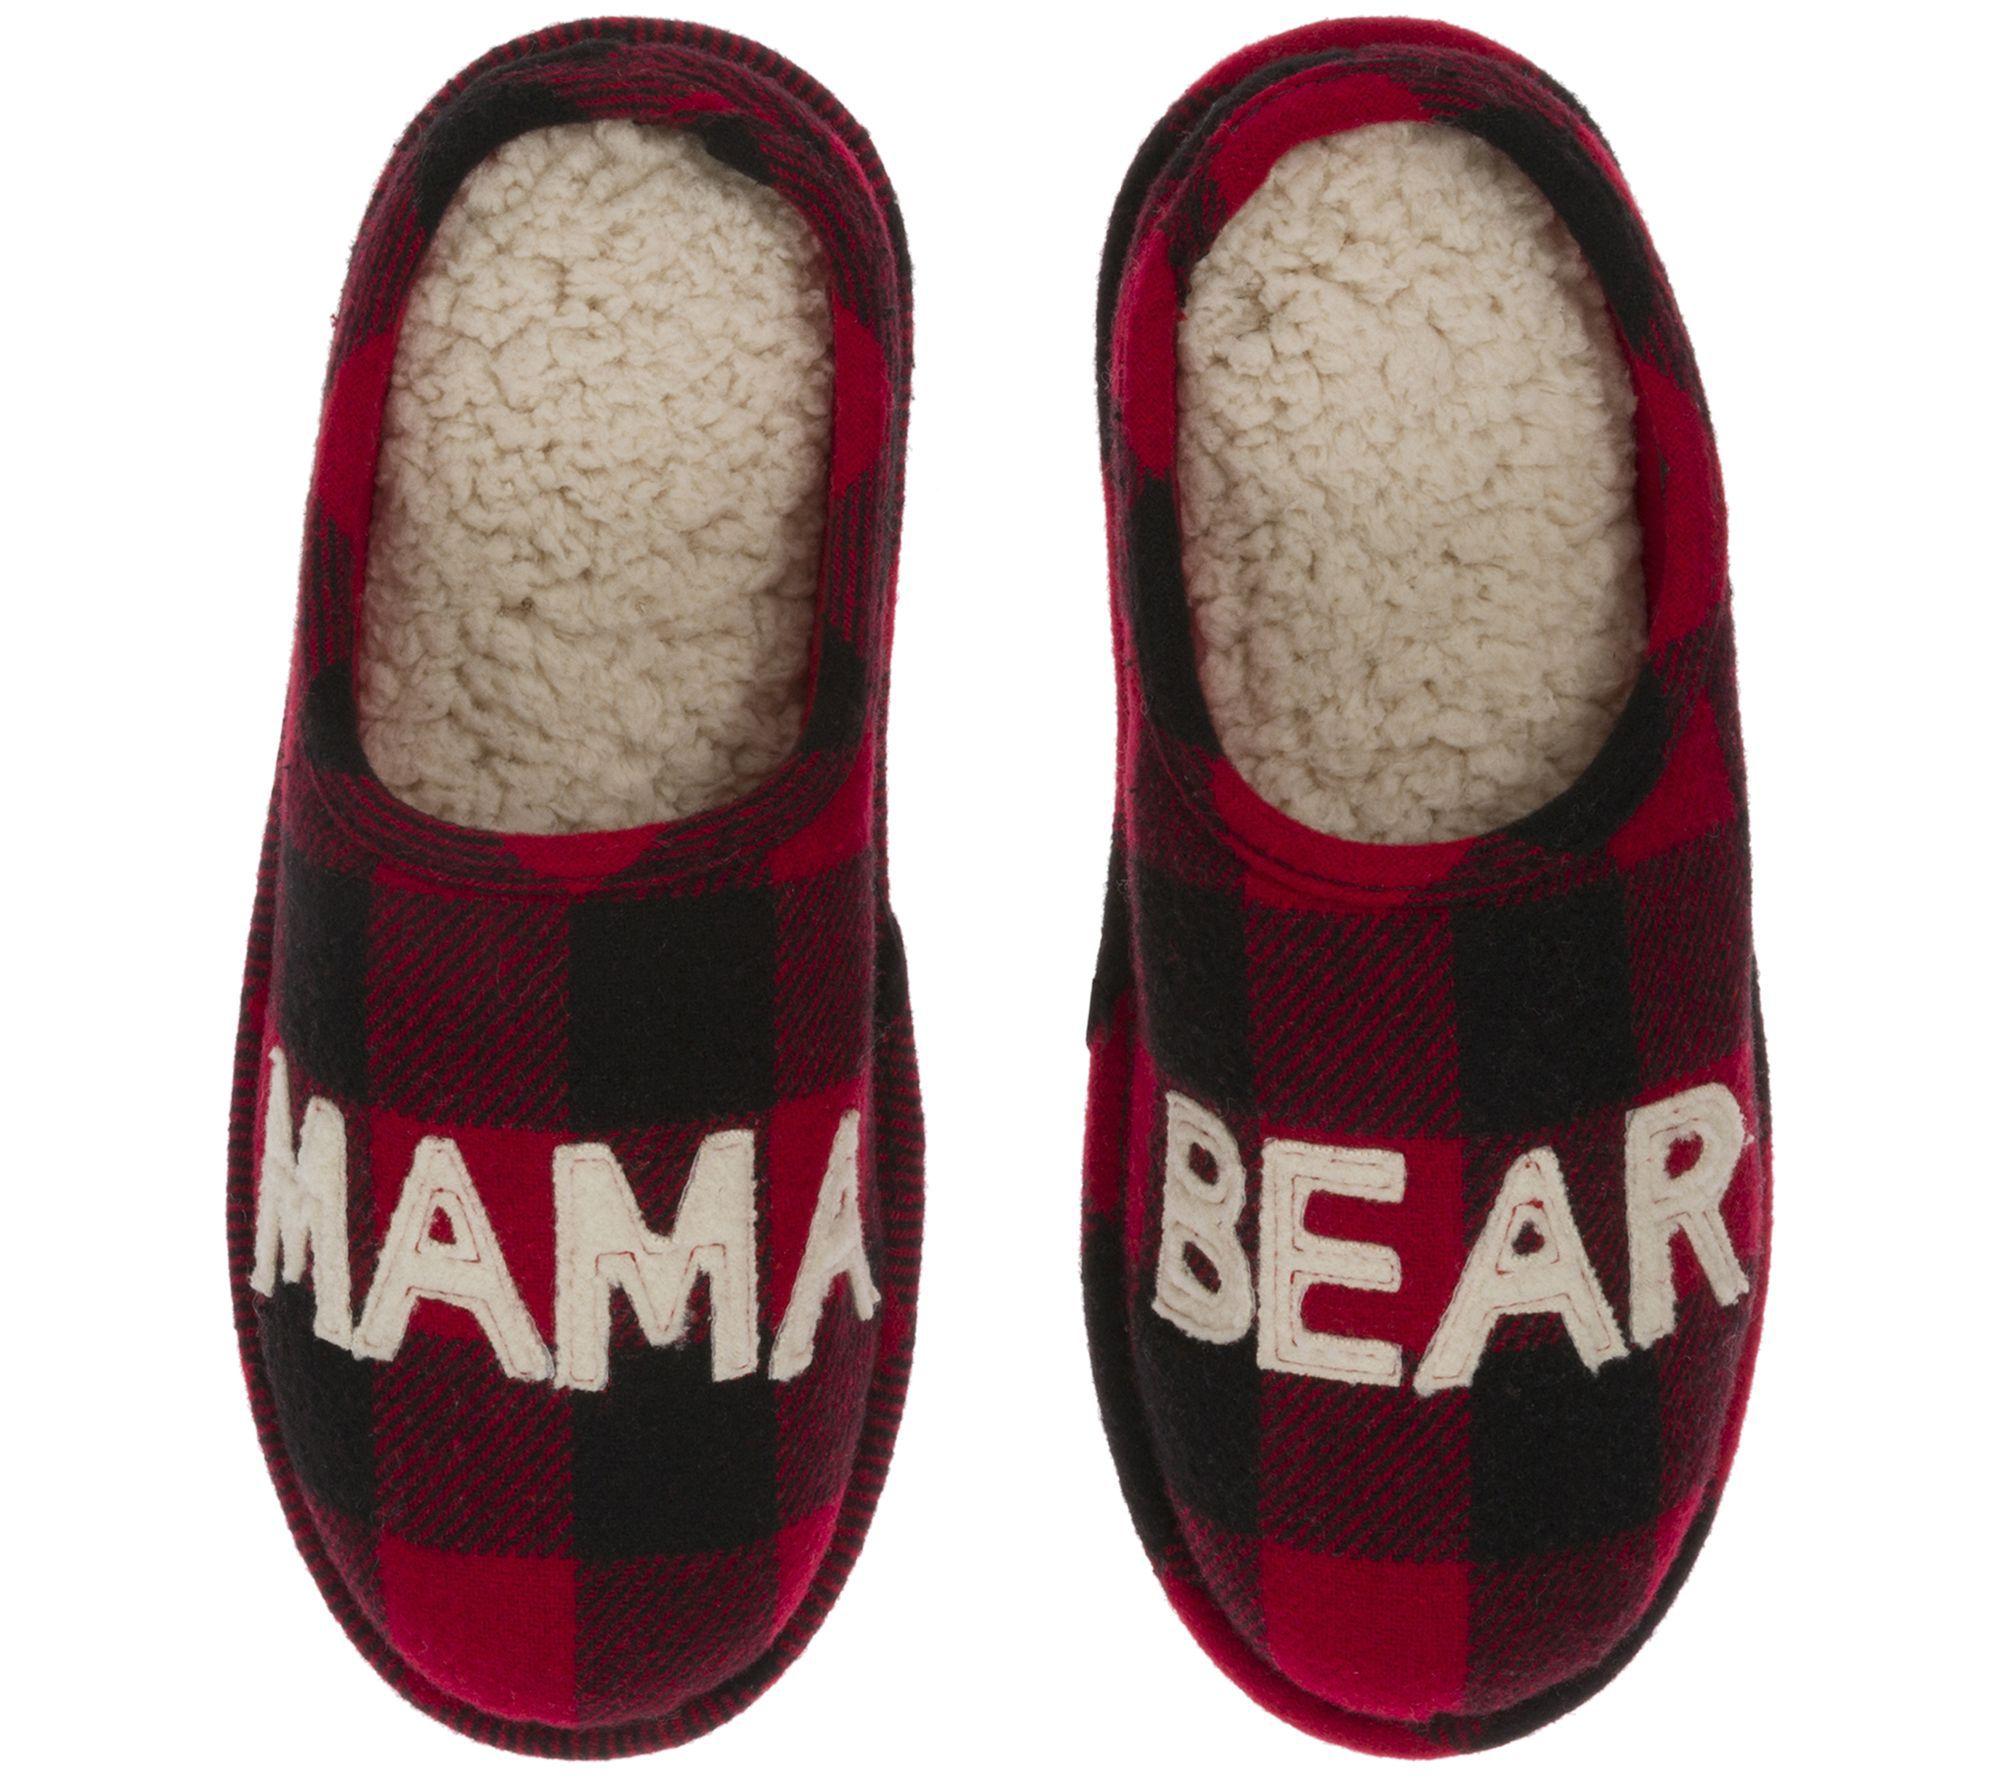 a87fd12e6e1 Dearfoams Mama Bear Slipper Clogs — QVC.com